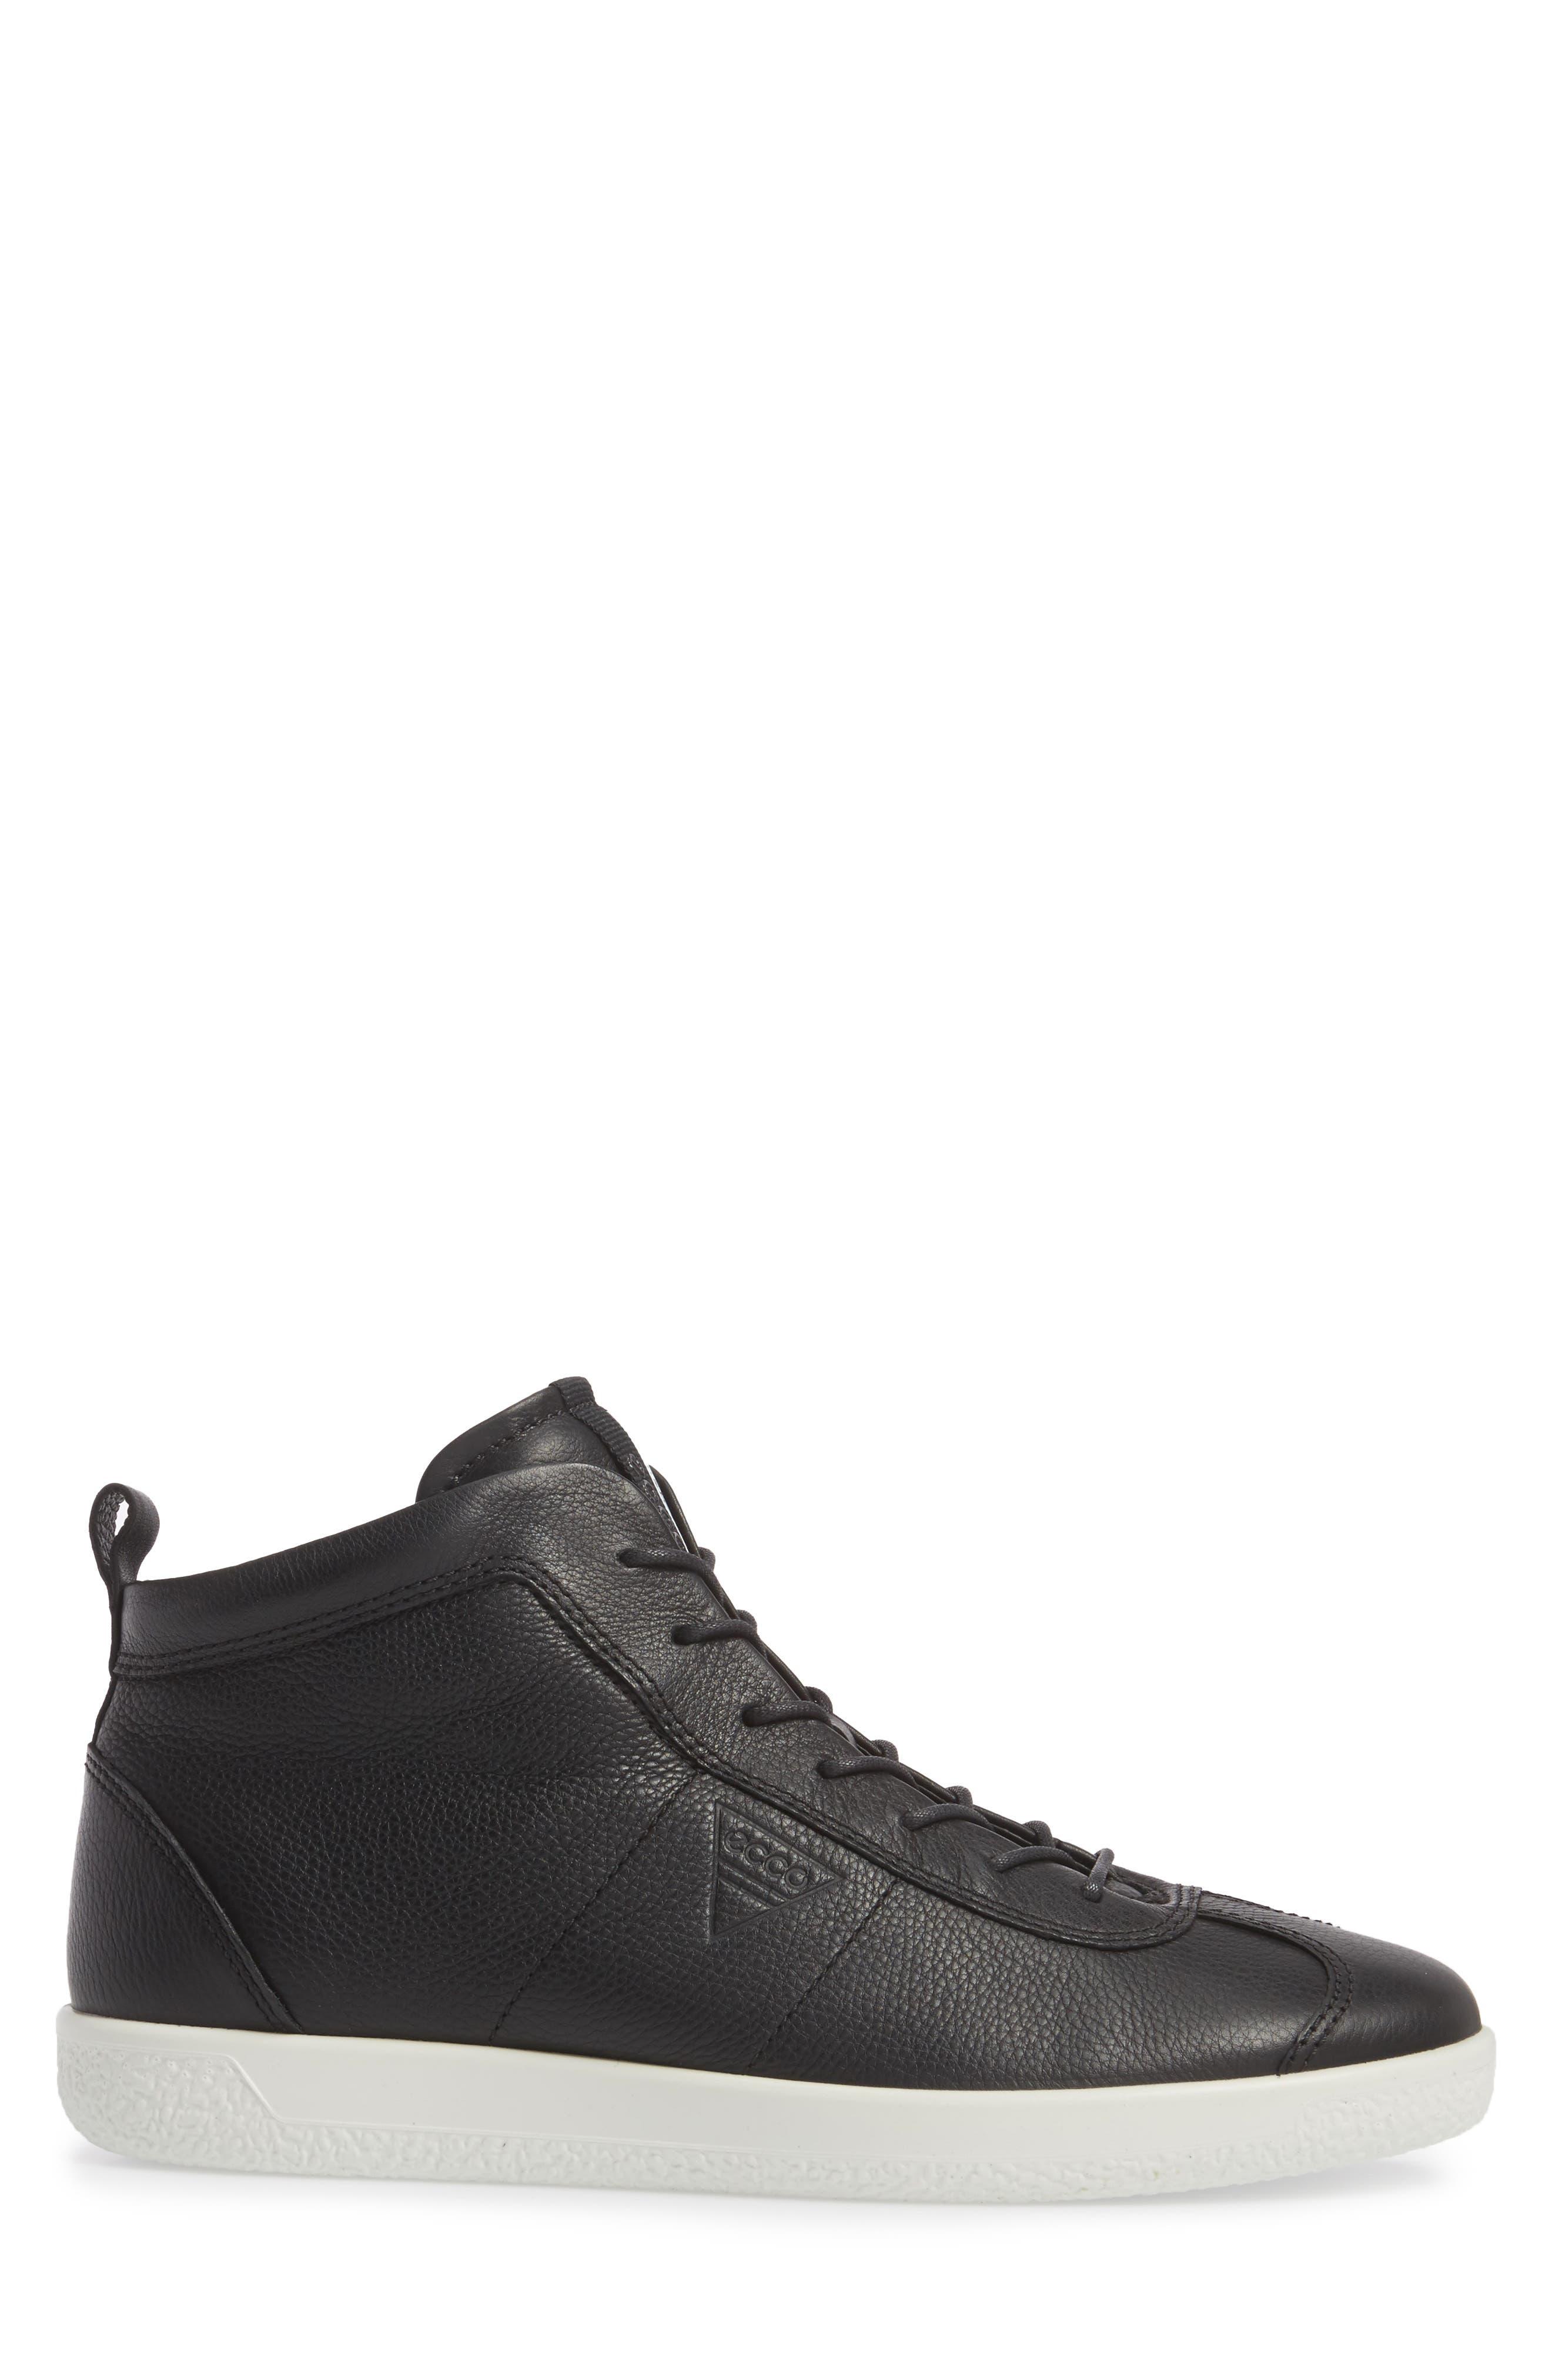 Soft 1 High Top Sneaker,                             Alternate thumbnail 3, color,                             009